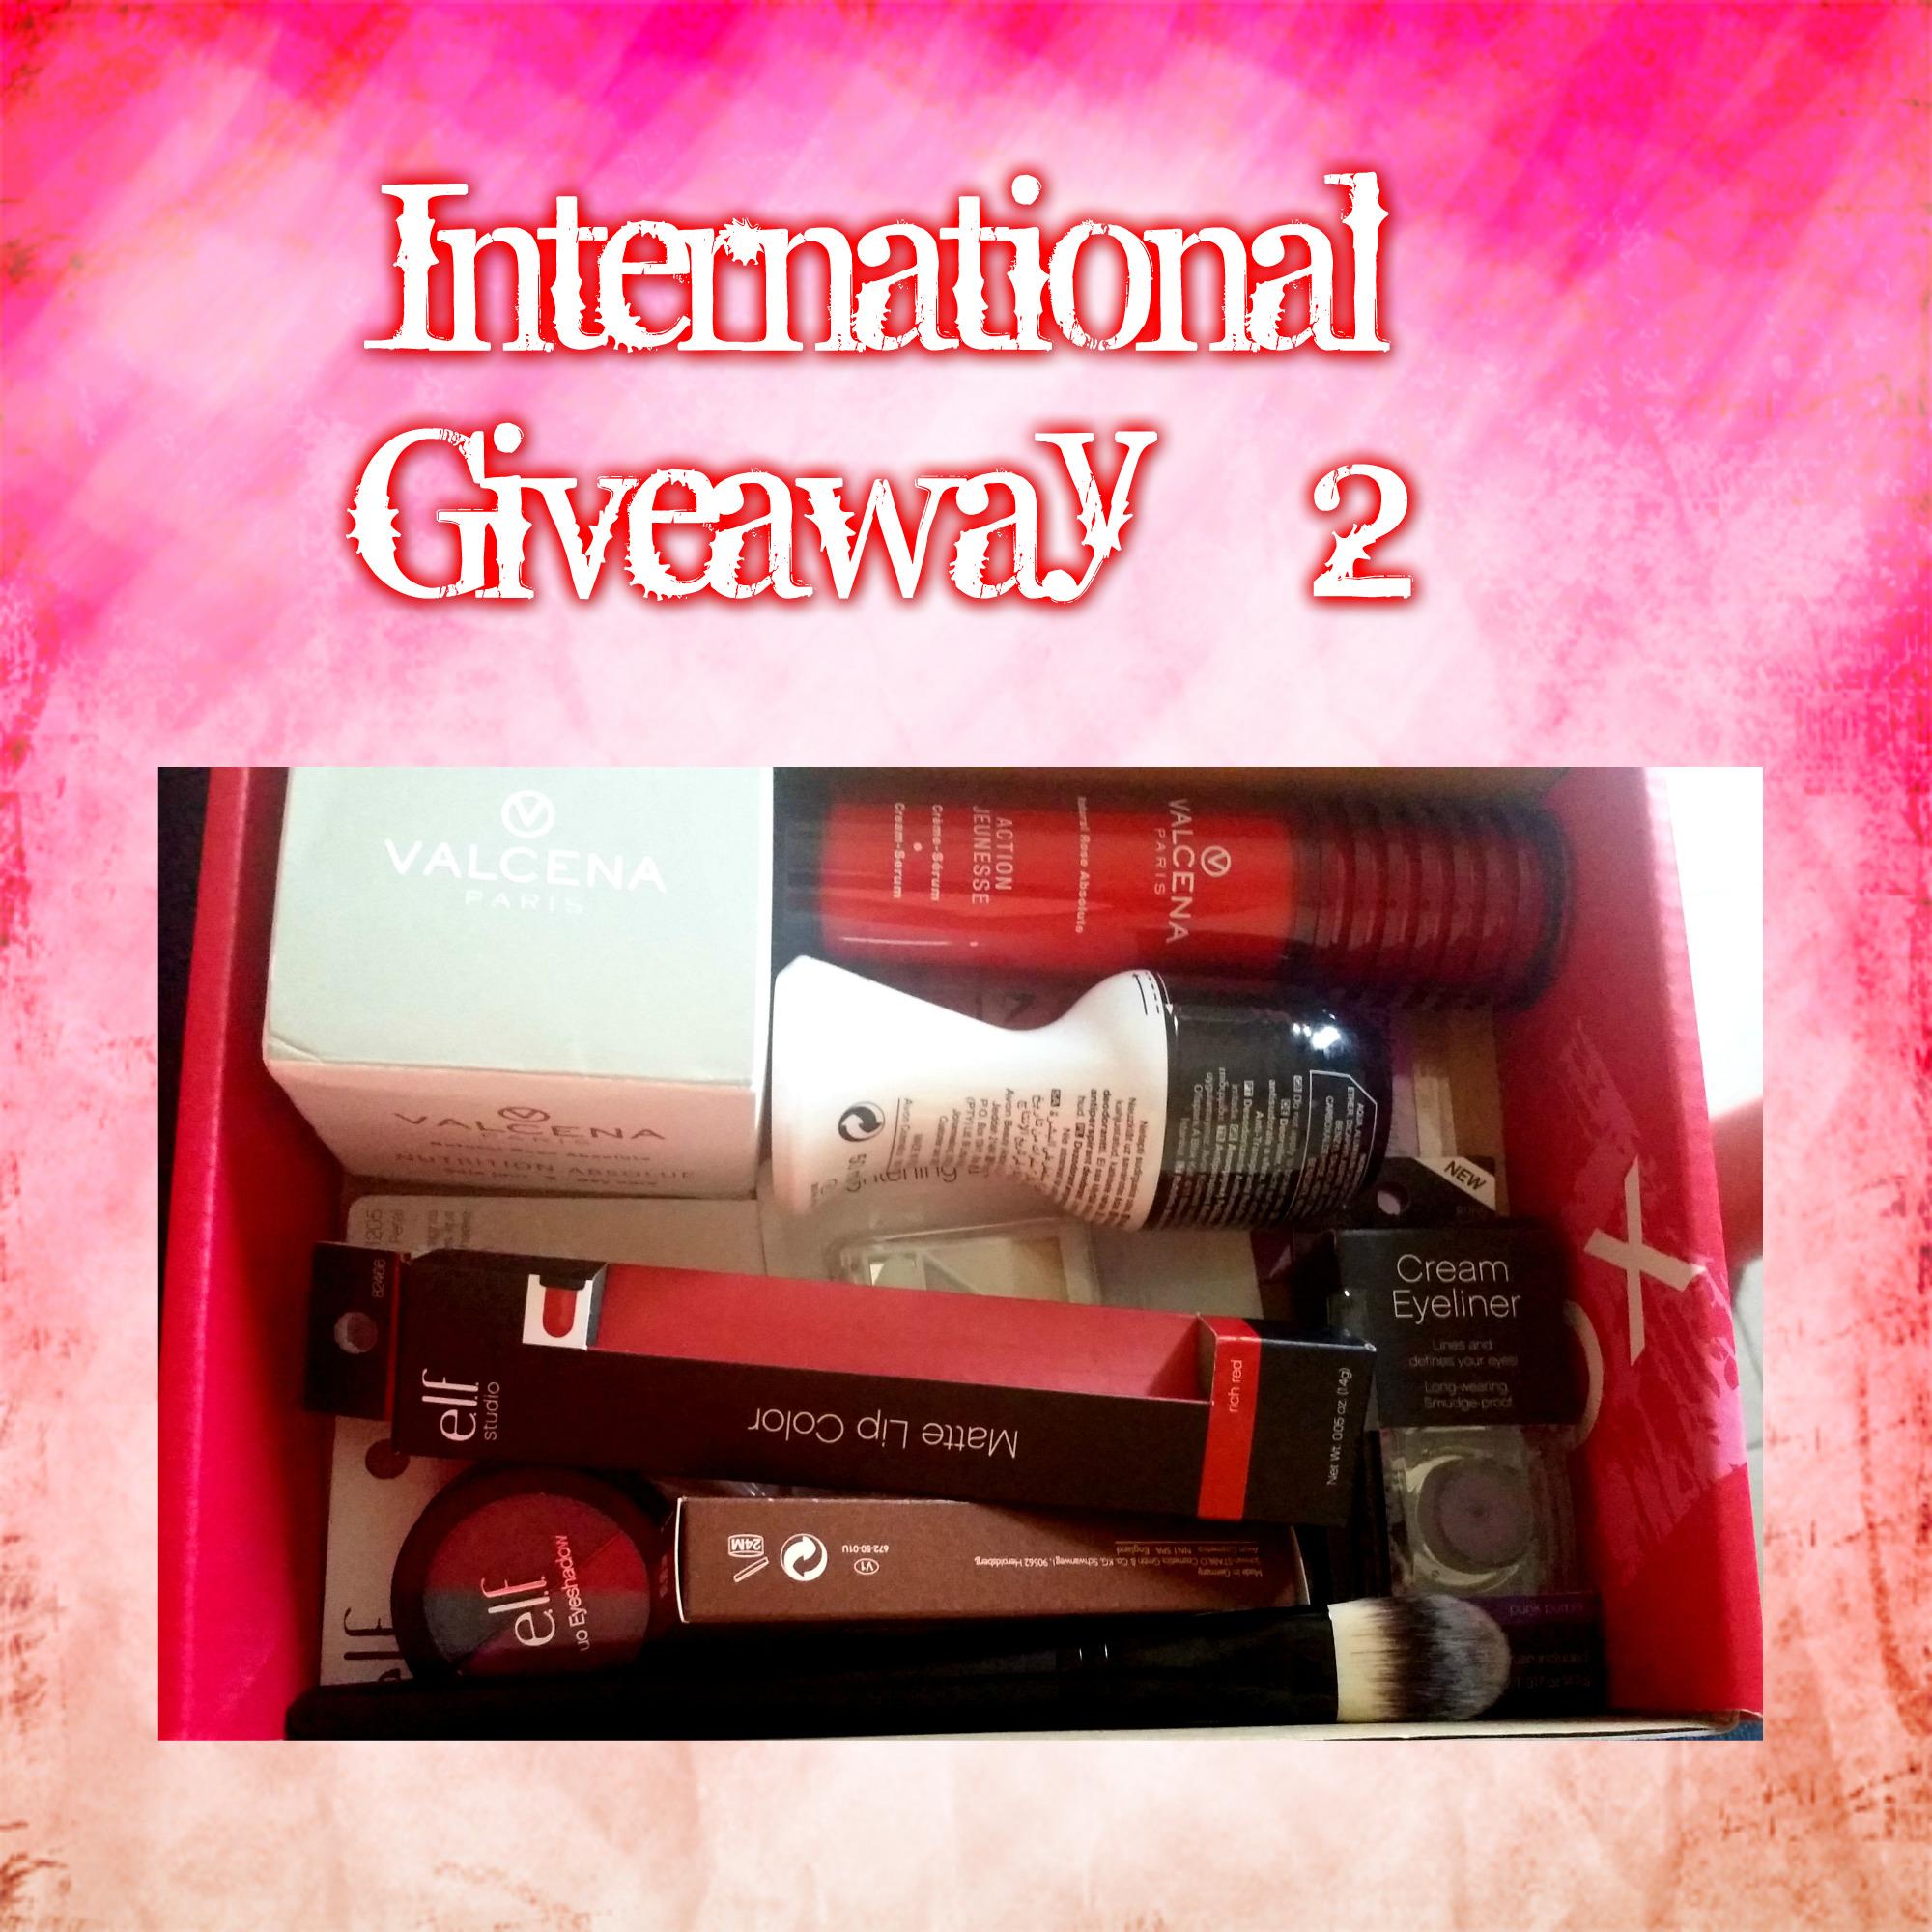 International Giveaway # 2